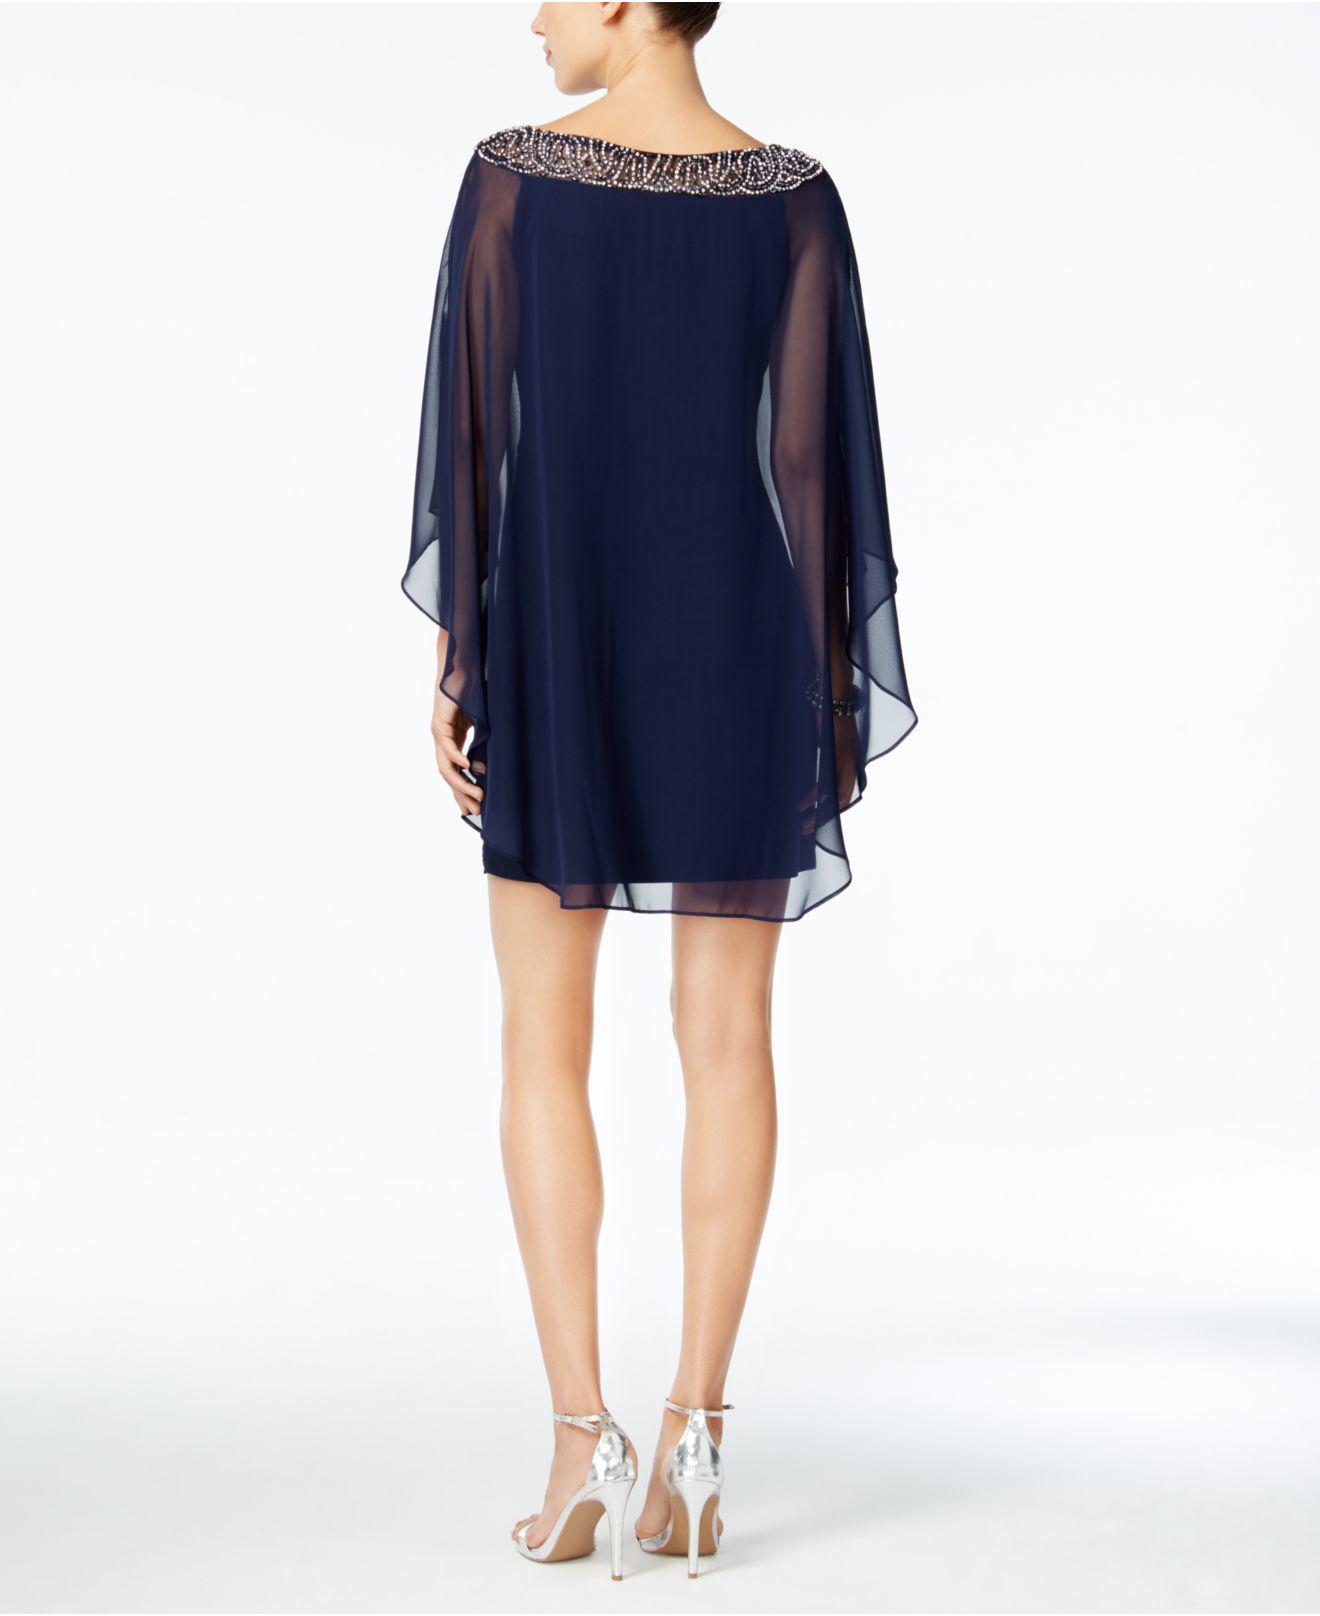 c2b23c6e3dba6 Xscape Embellished Chiffon Petite Cape-overlay Dress in Blue - Lyst